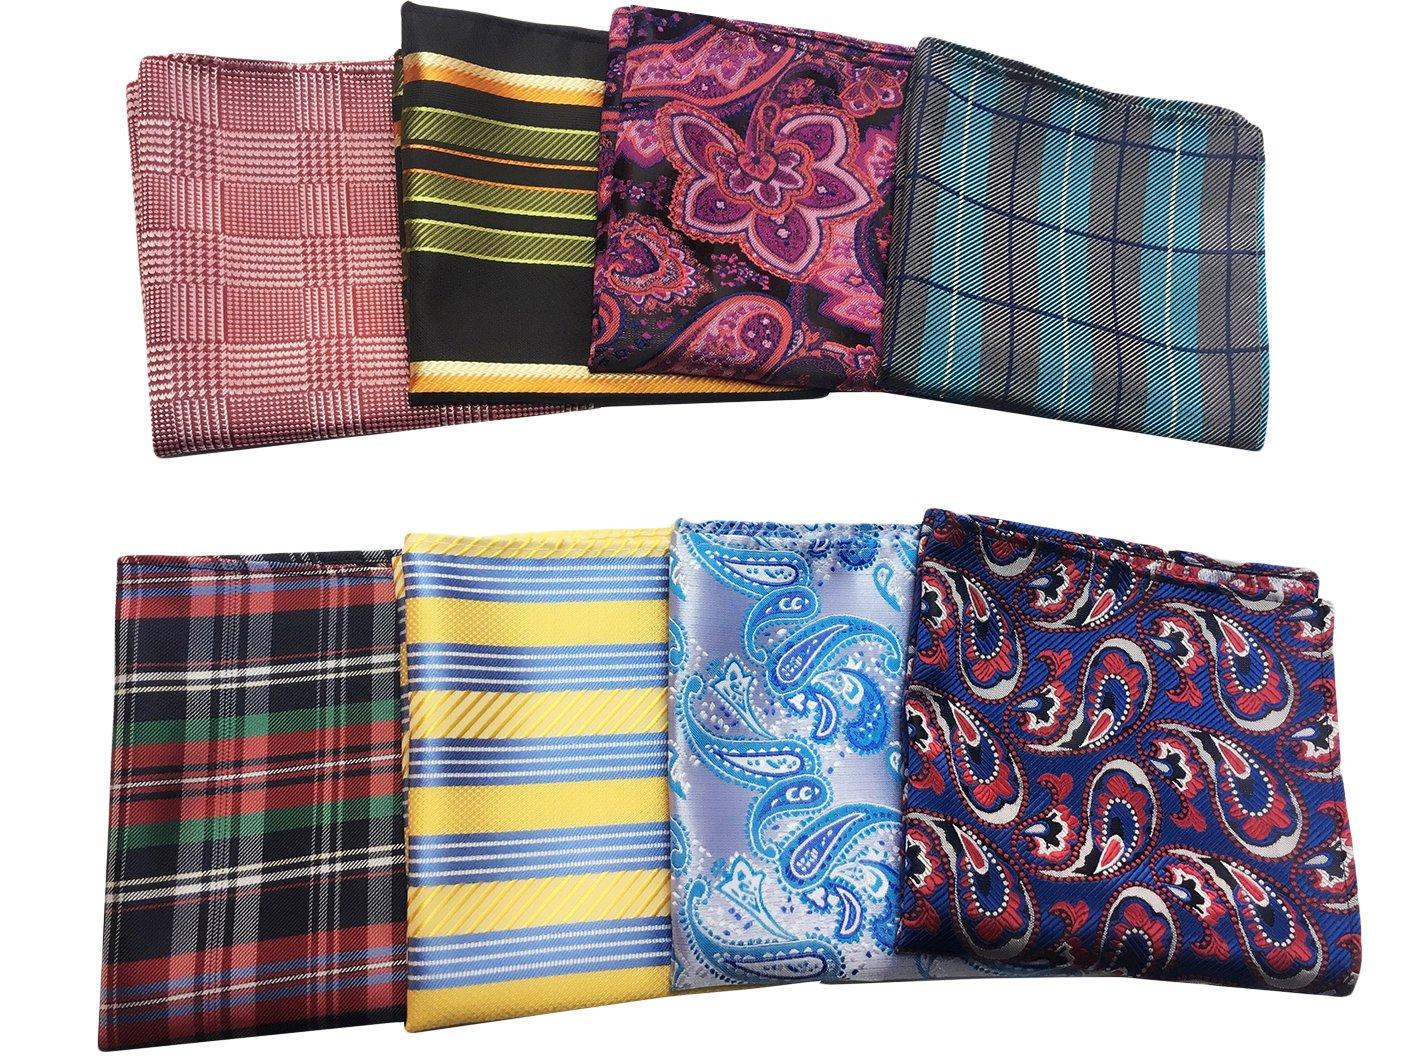 MENDENG Men's 8 Pack Mixed Paisley Floral Pocket Square Wedding Handkerchief ENG0784